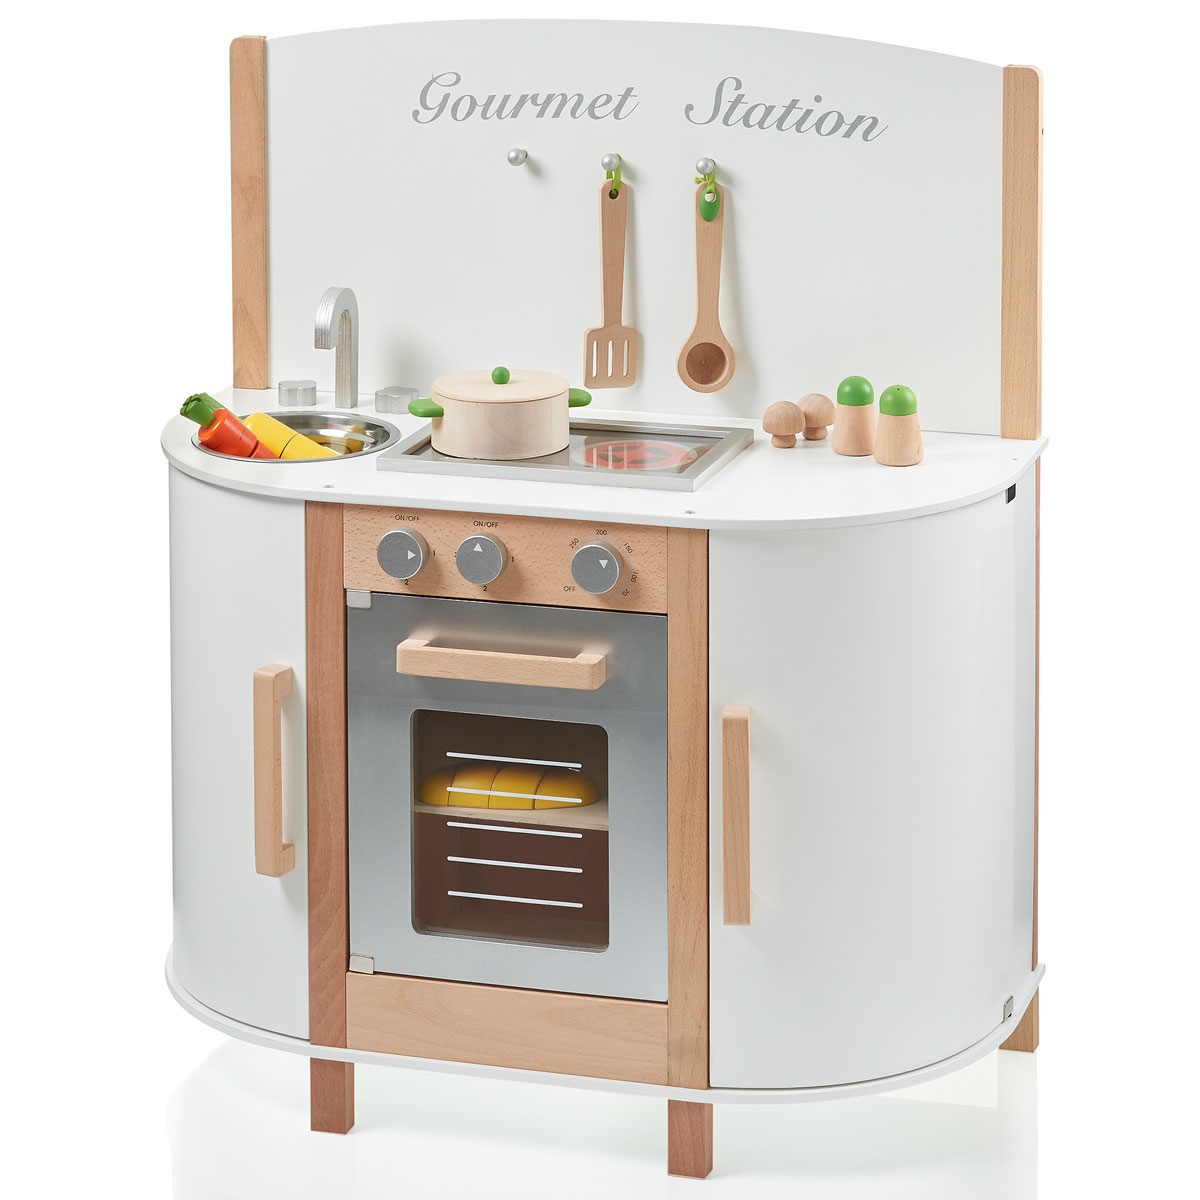 sun spielk che gourmet station weiss aus holz 04147. Black Bedroom Furniture Sets. Home Design Ideas